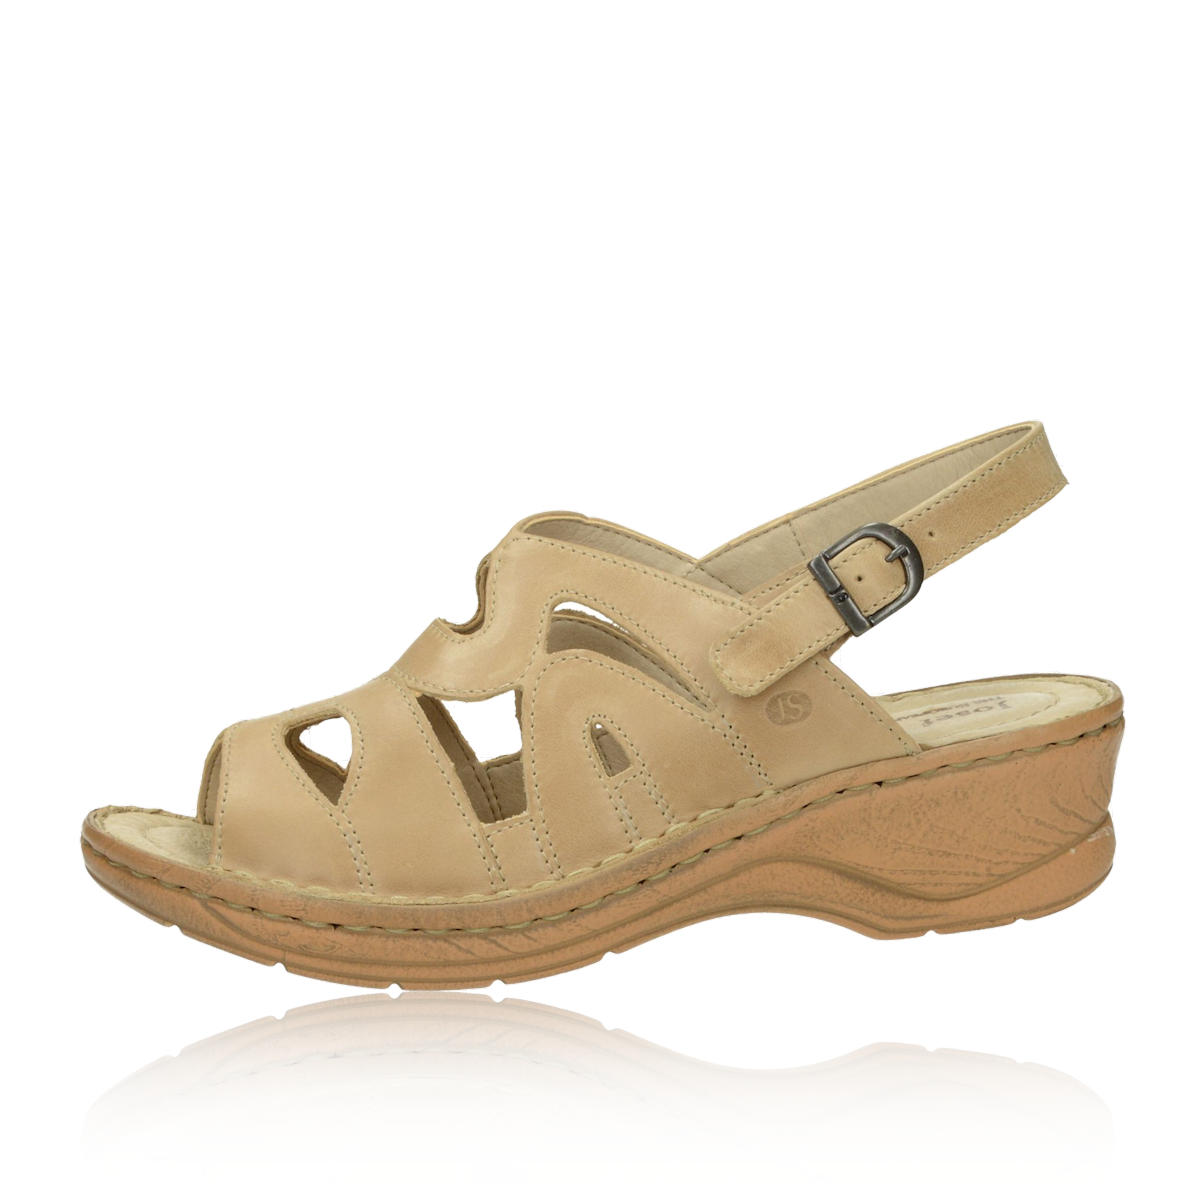 Nakupujte dámsku obuv Josef Seibel online  6c01eca8a9d